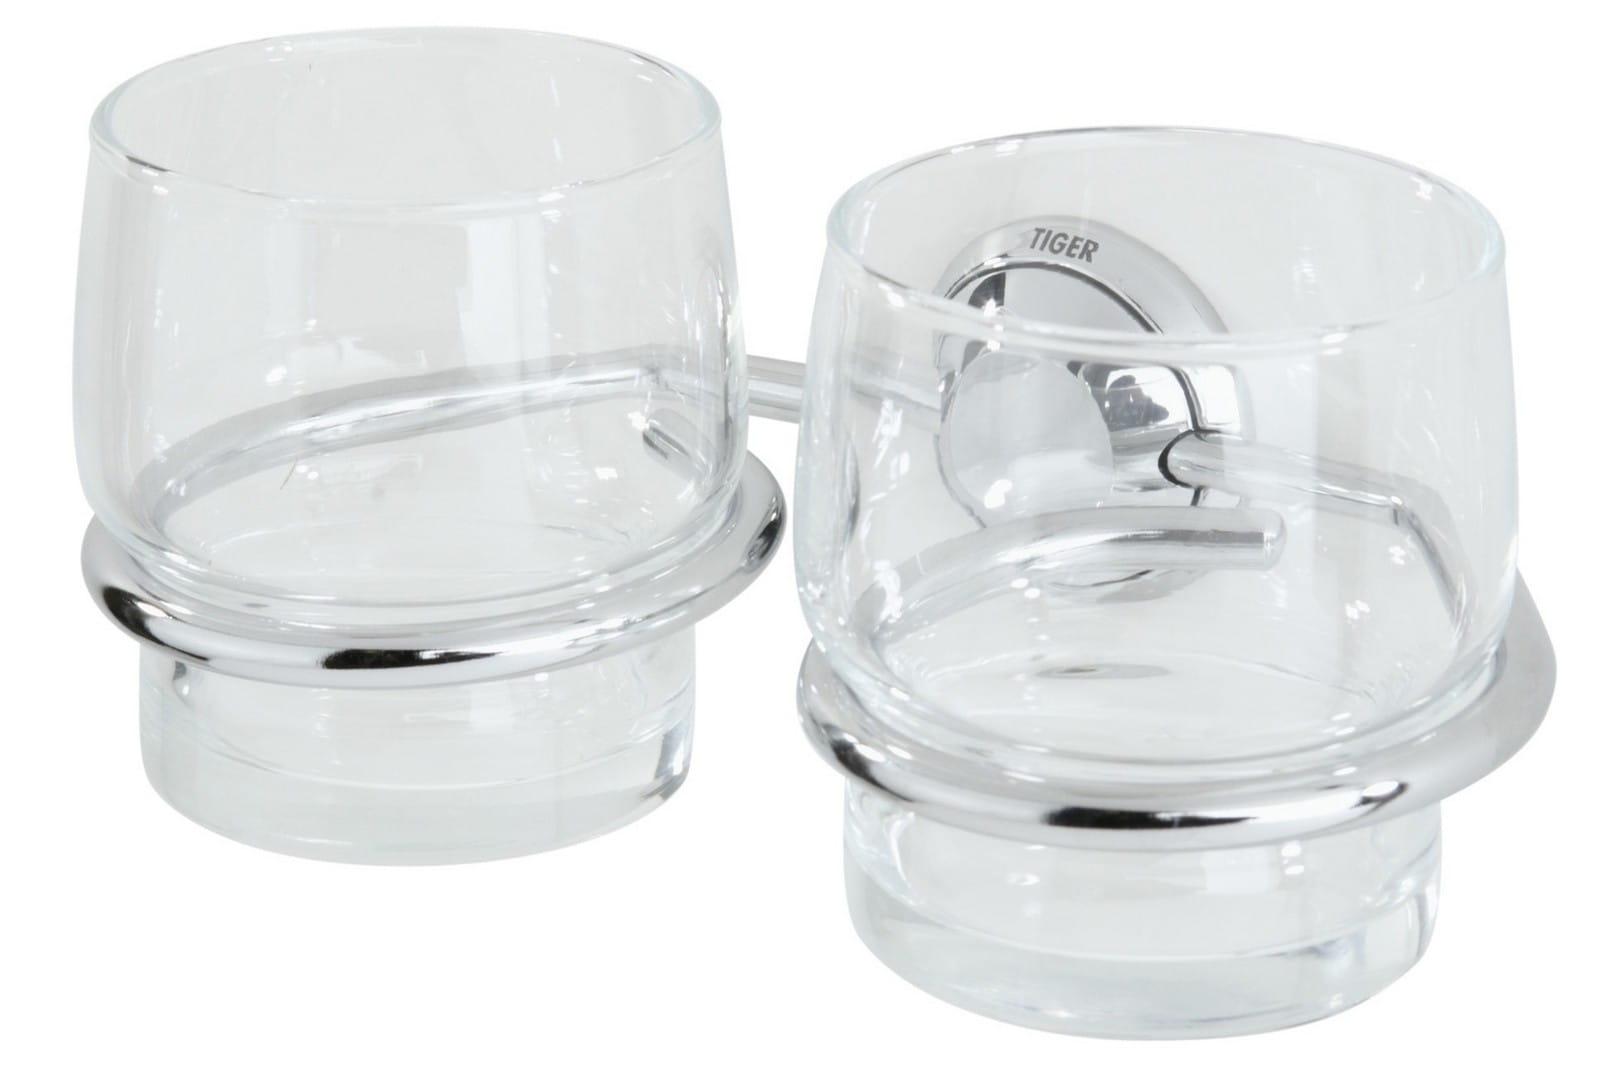 Tiger Torino szklanka podwójna chrom 3802.03